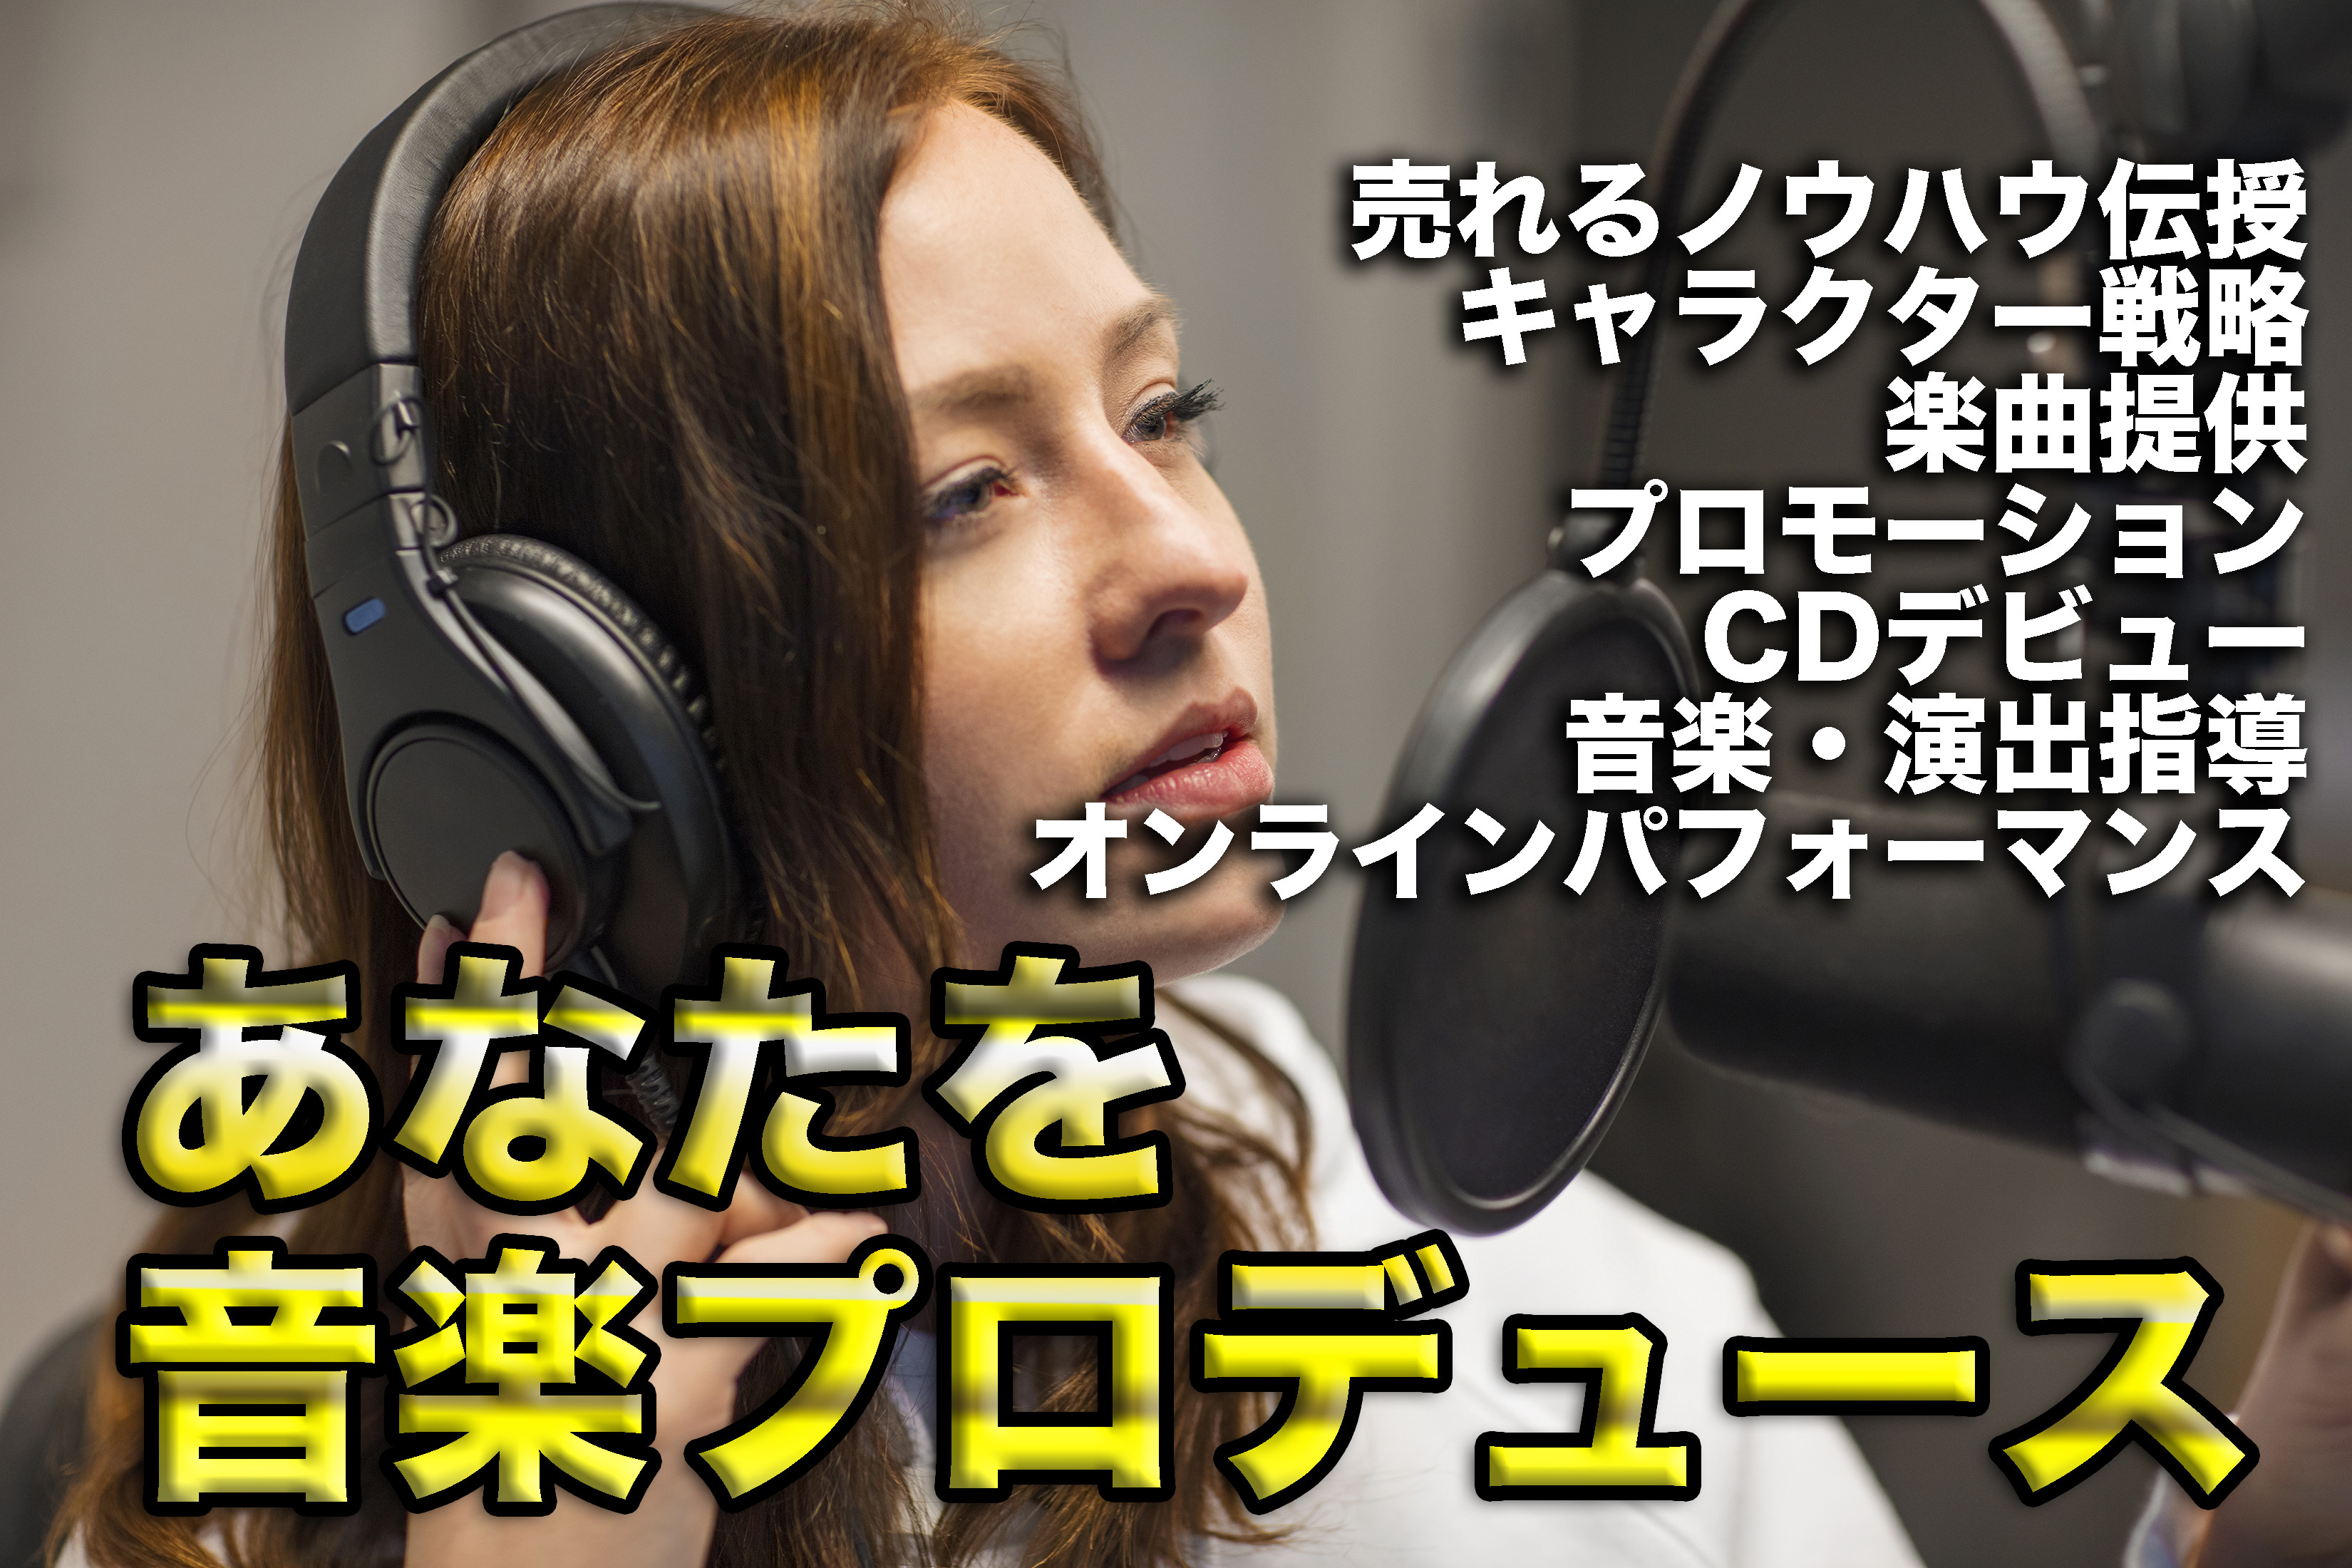 graphicstock-jockey-listening-through-headphones-in-radio-studio_BOlGr2TSzb.jpg